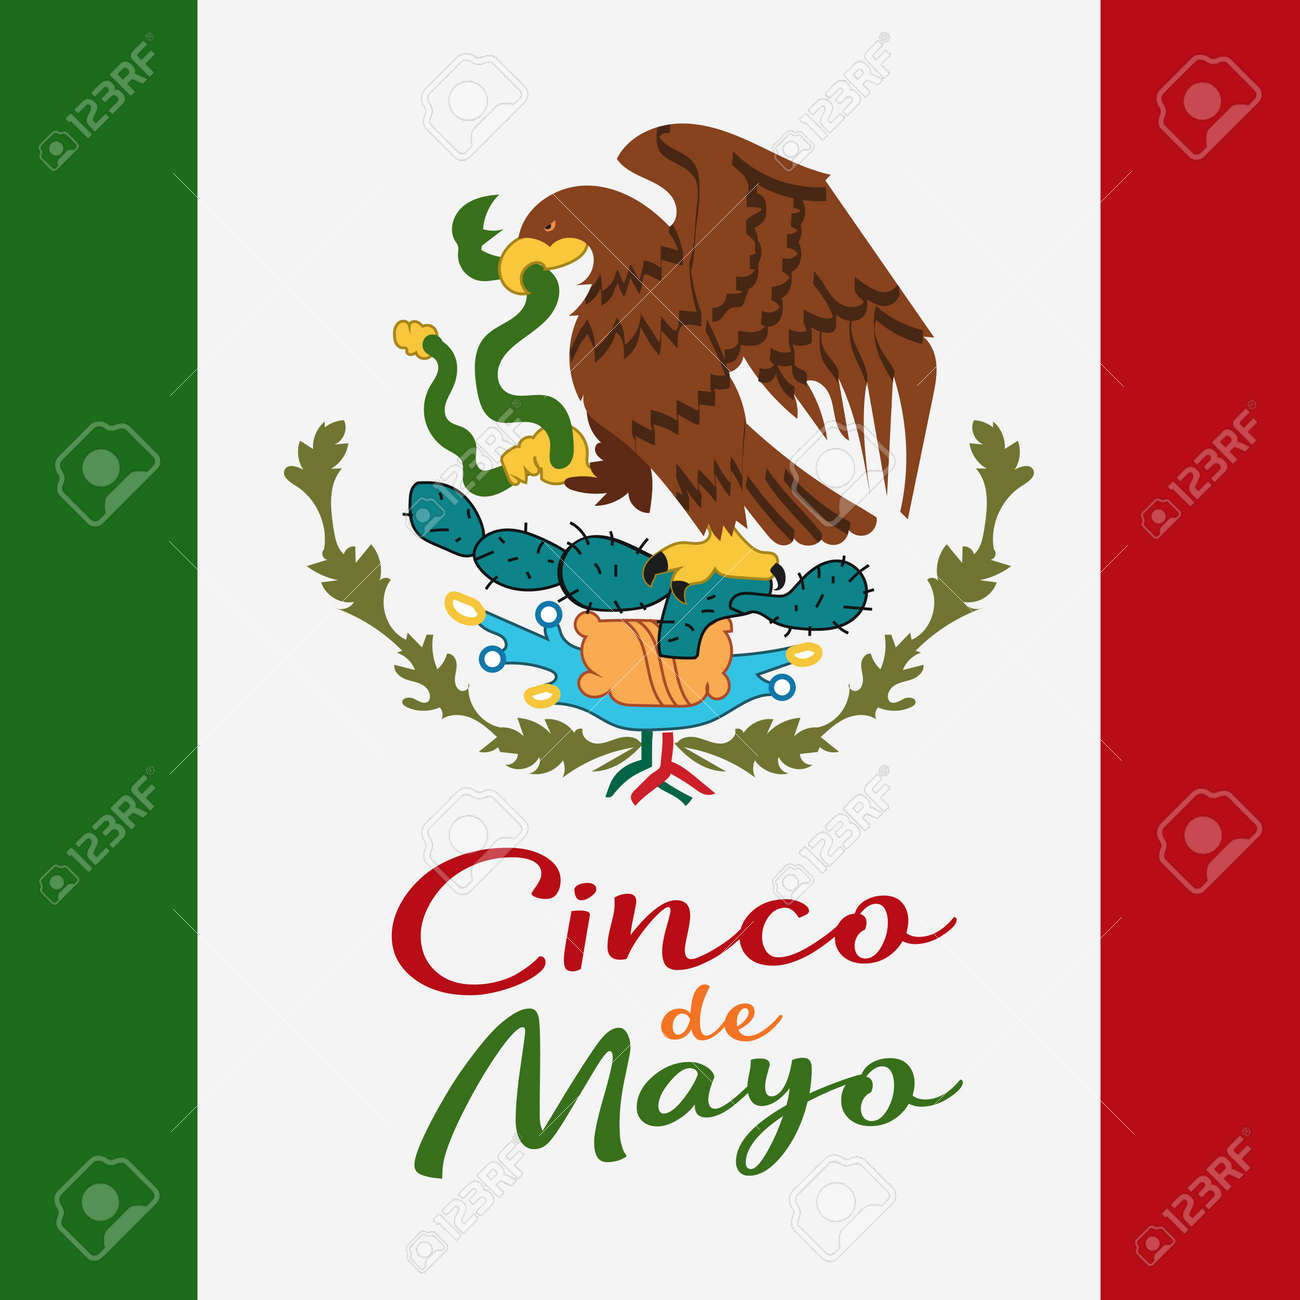 Cinco de mayo poster design symbol of the mexican flag eagle symbol of the mexican flag eagle with snake biocorpaavc Choice Image